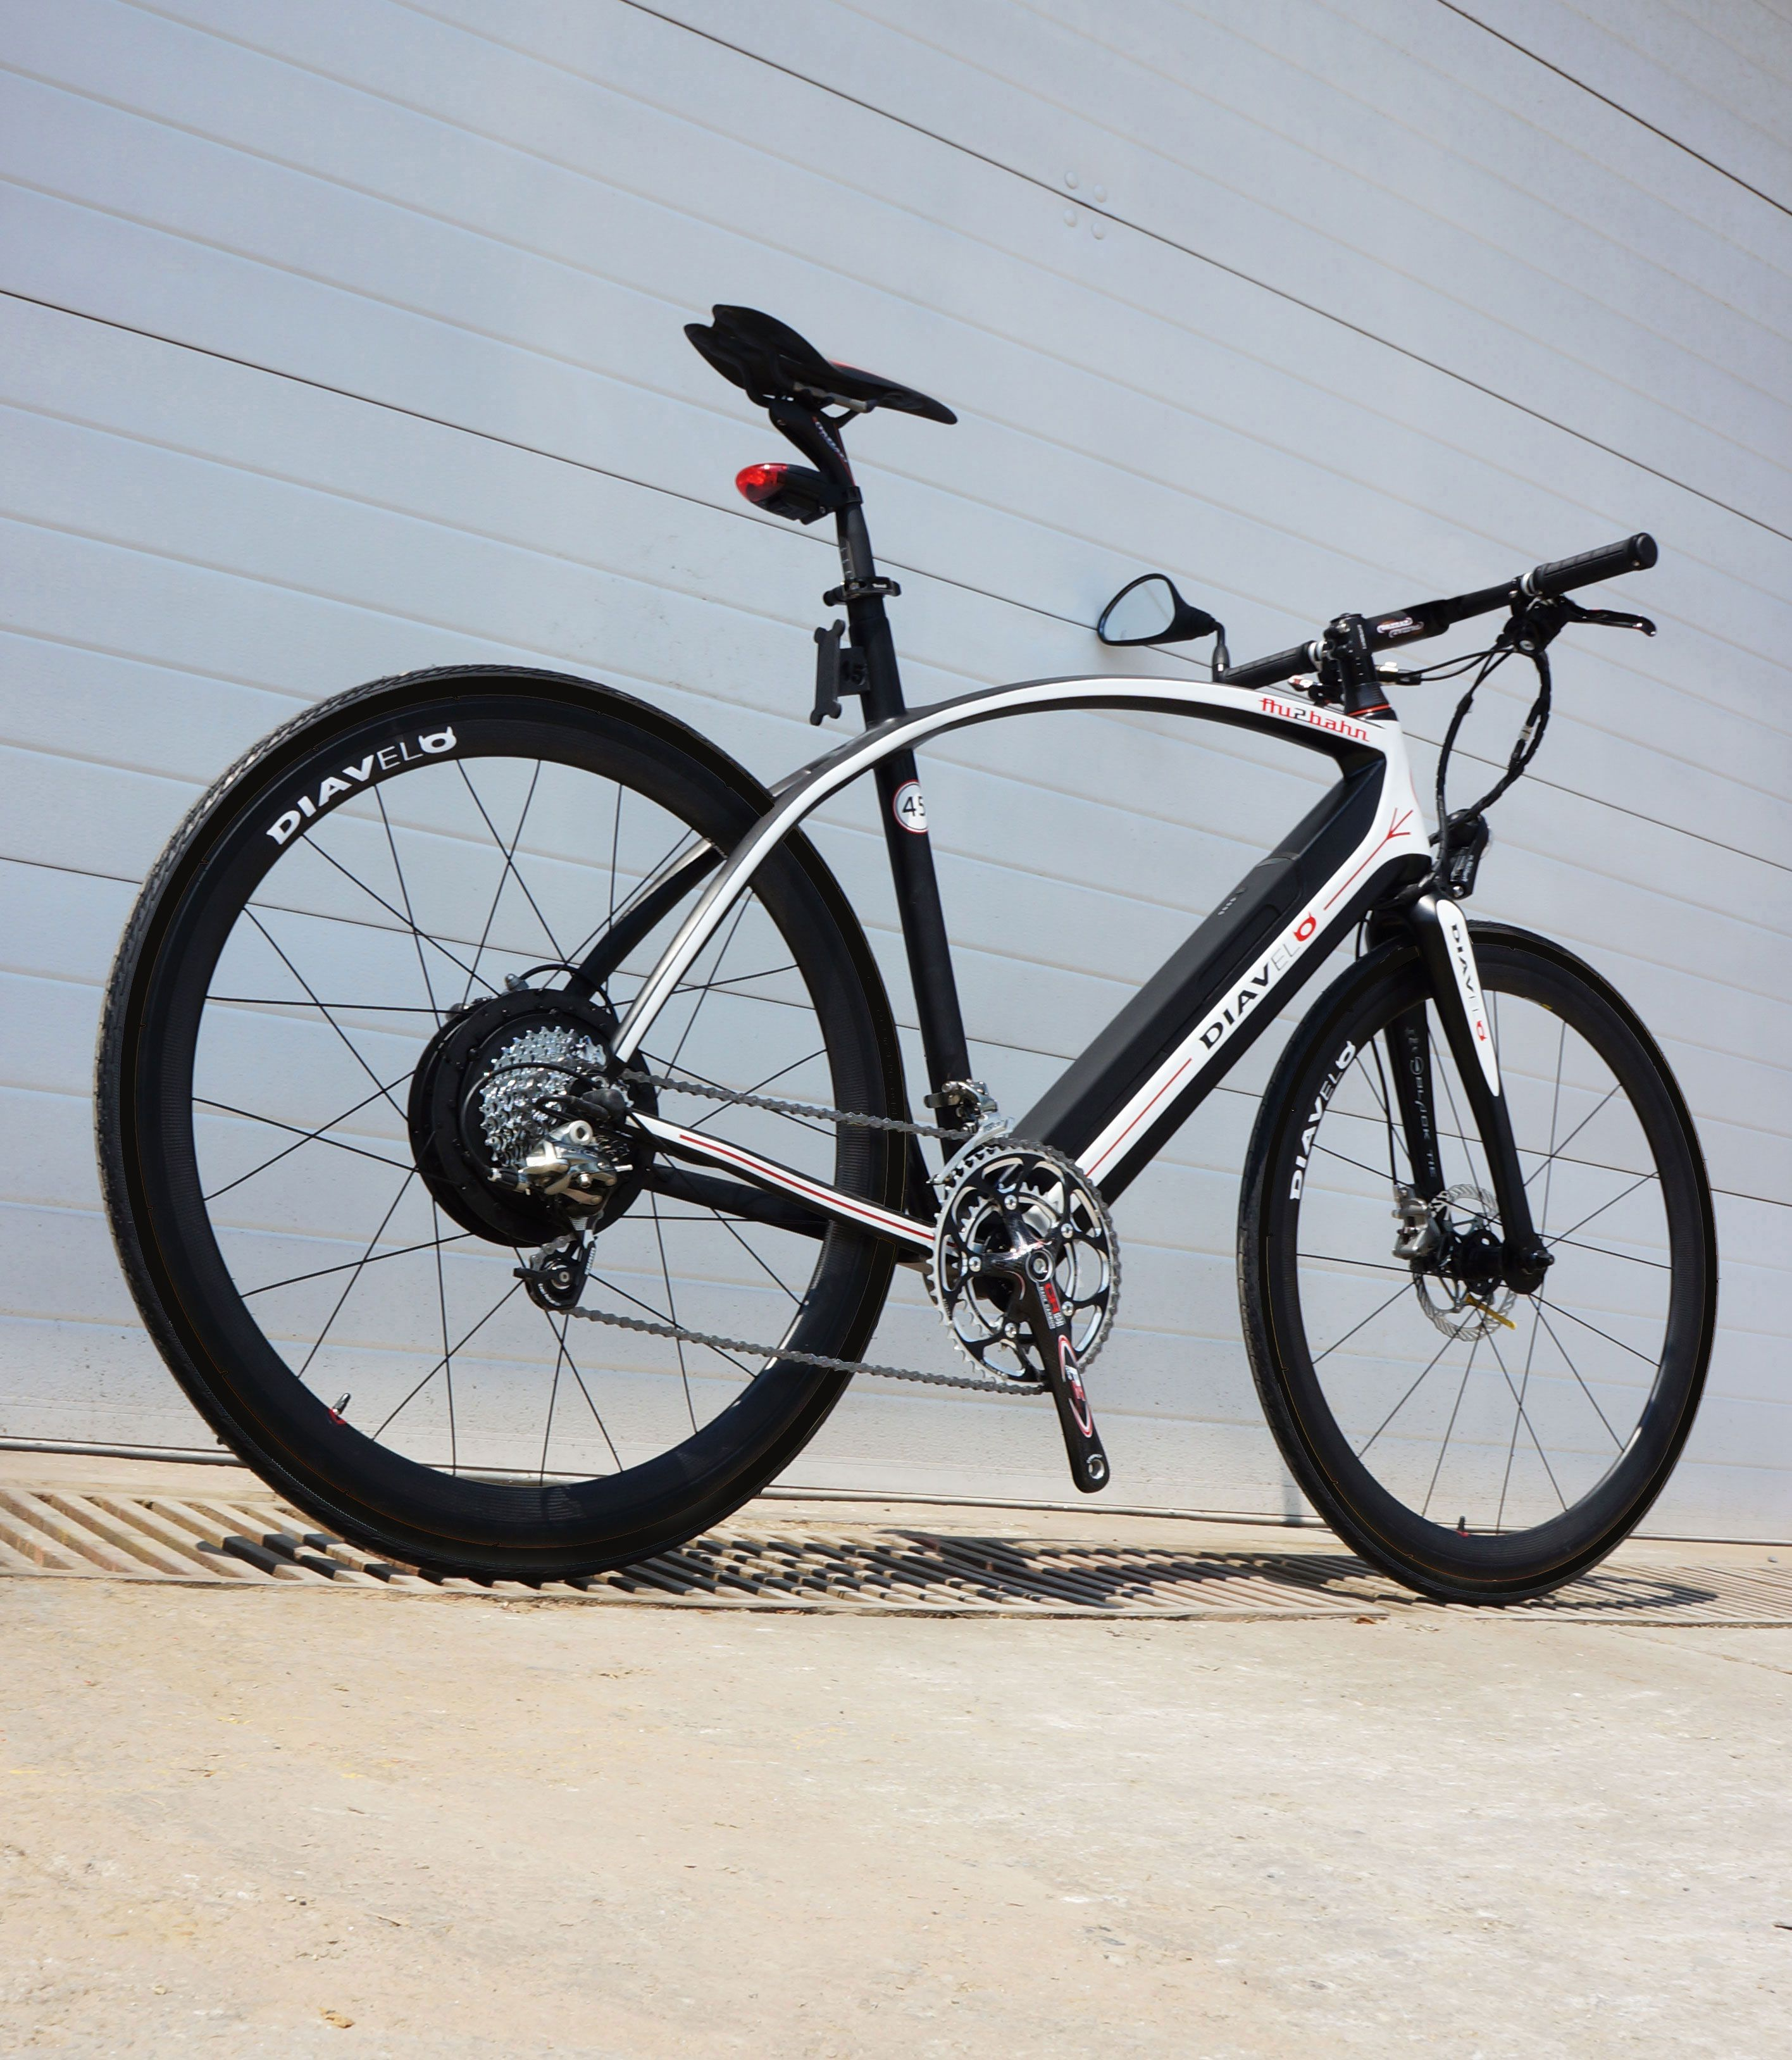 leichtestes s pedelec e bike au2bahn carbon wiegt 14 5 kg s pedelec pedelec und radfahren. Black Bedroom Furniture Sets. Home Design Ideas